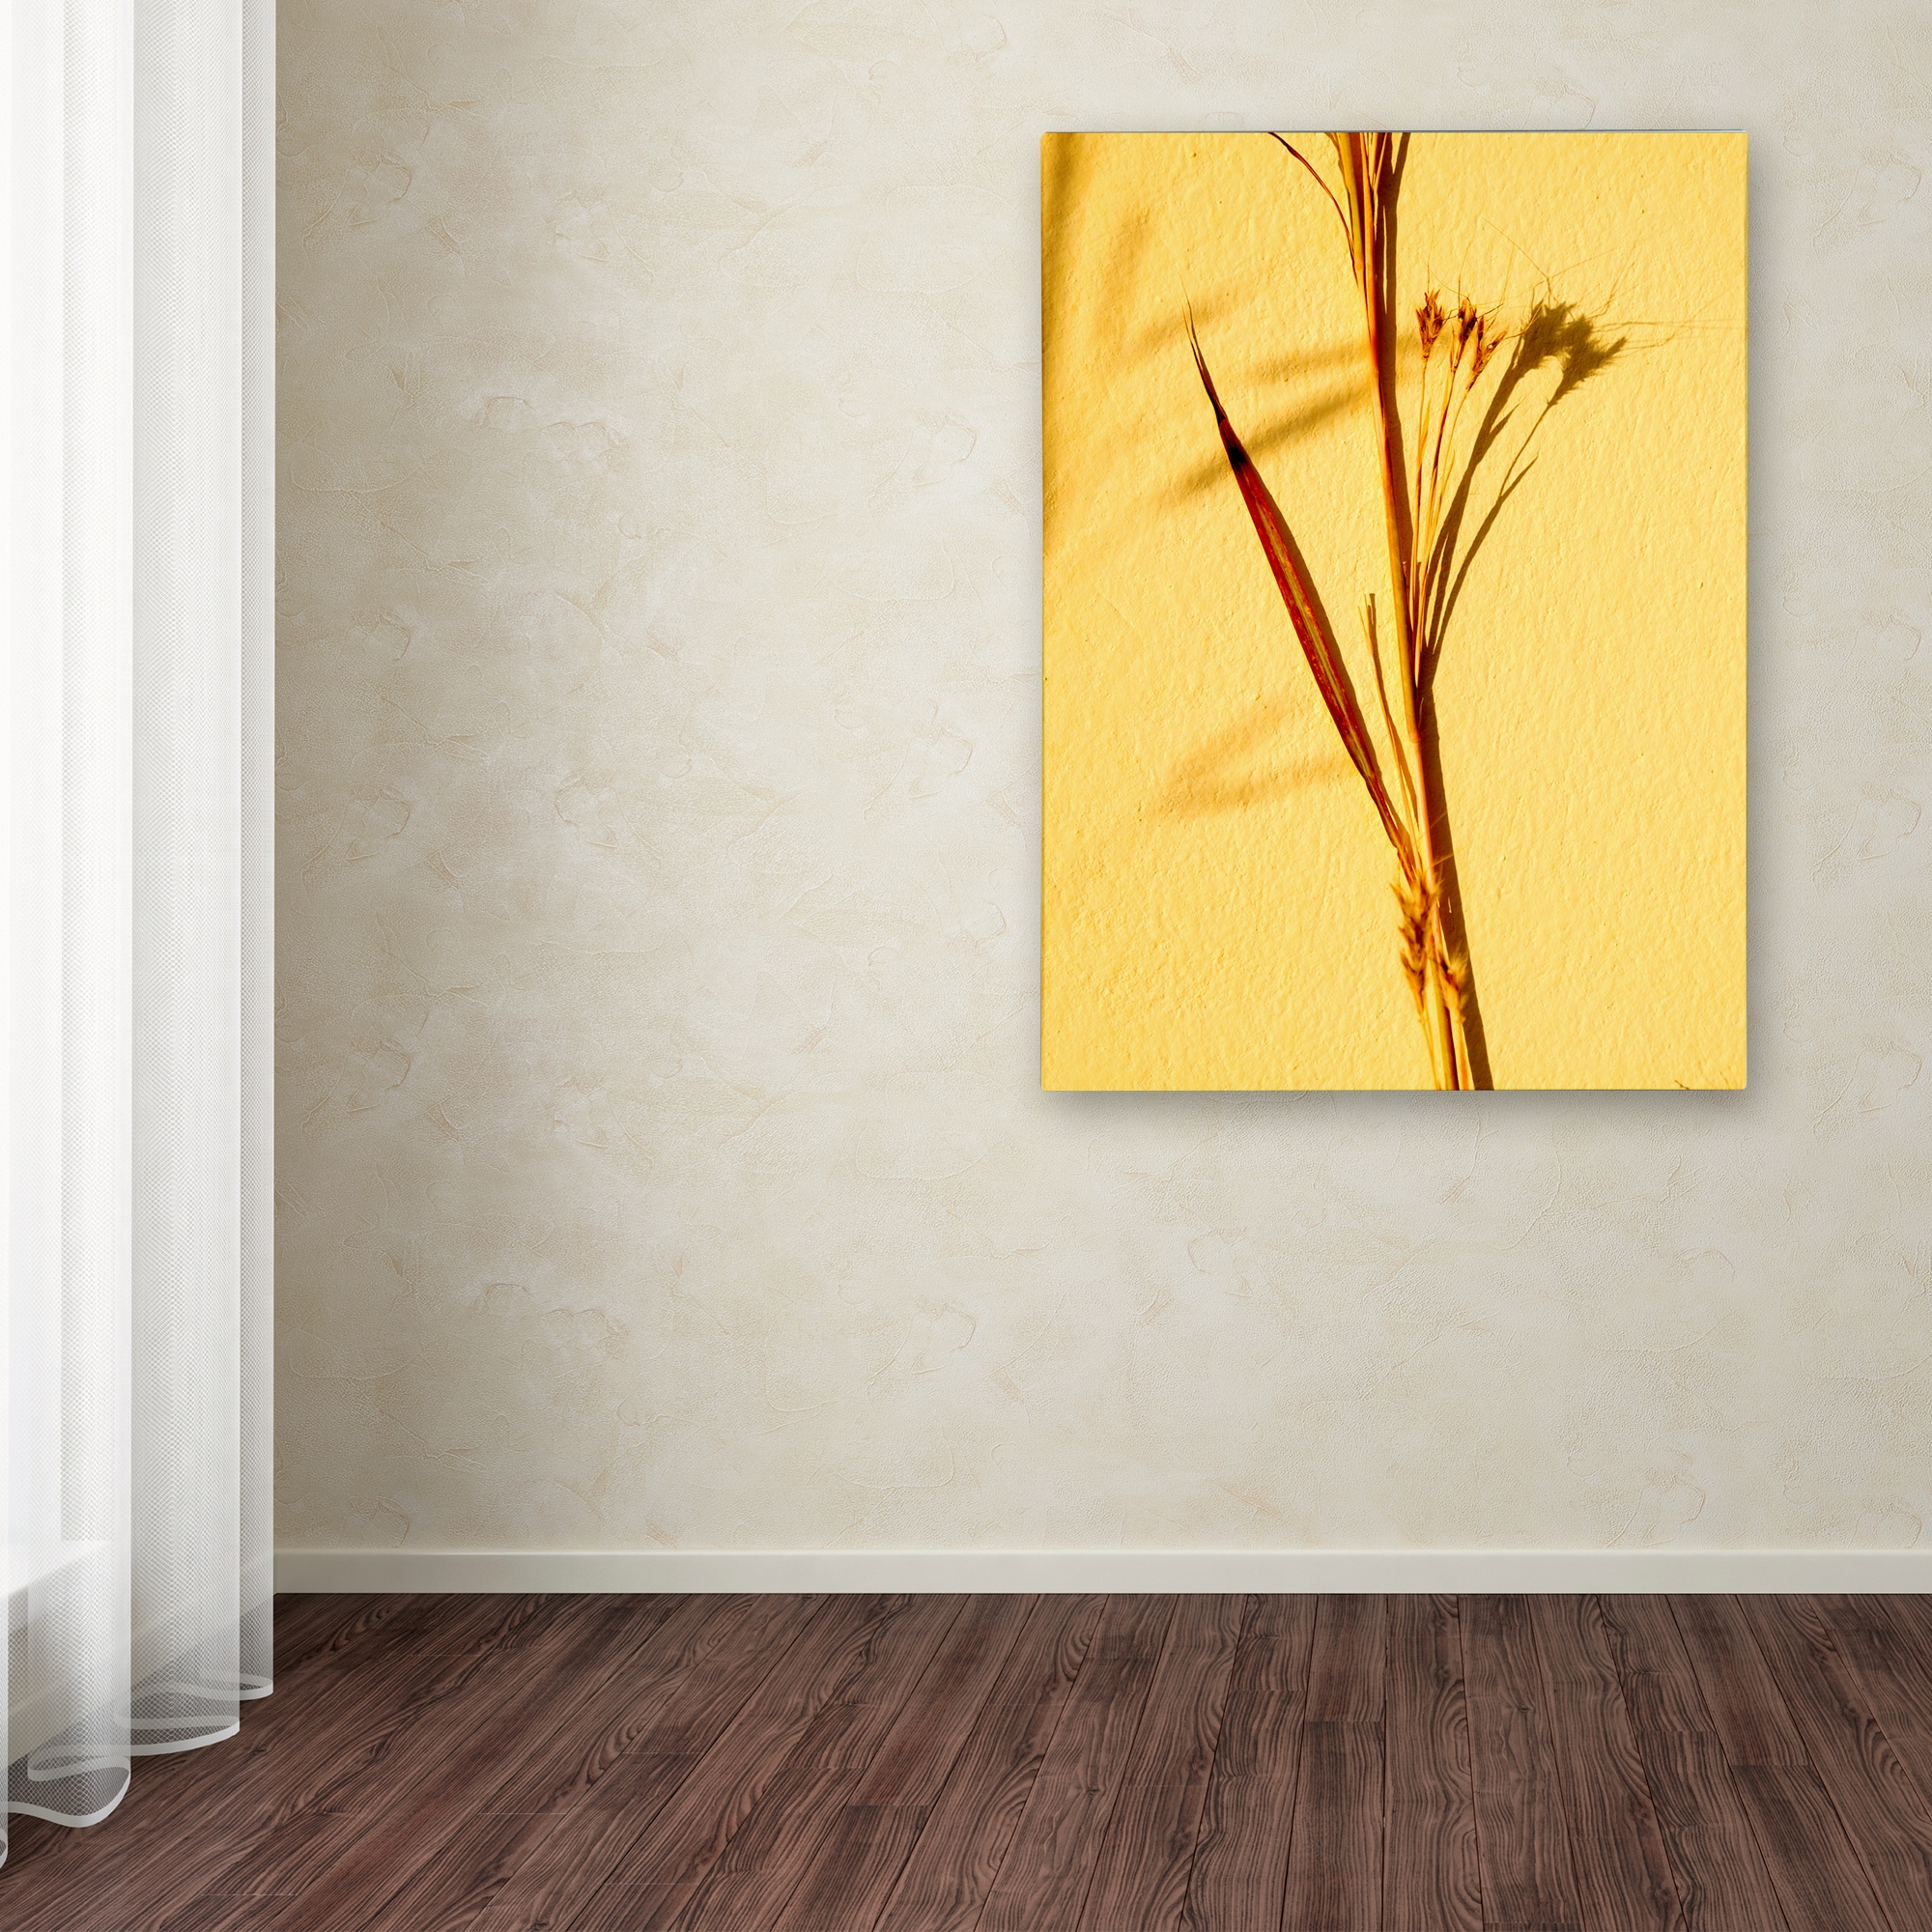 Shop Geoffrey Baris \'Cream Of Wheat 3\' Canvas Art - Free Shipping ...